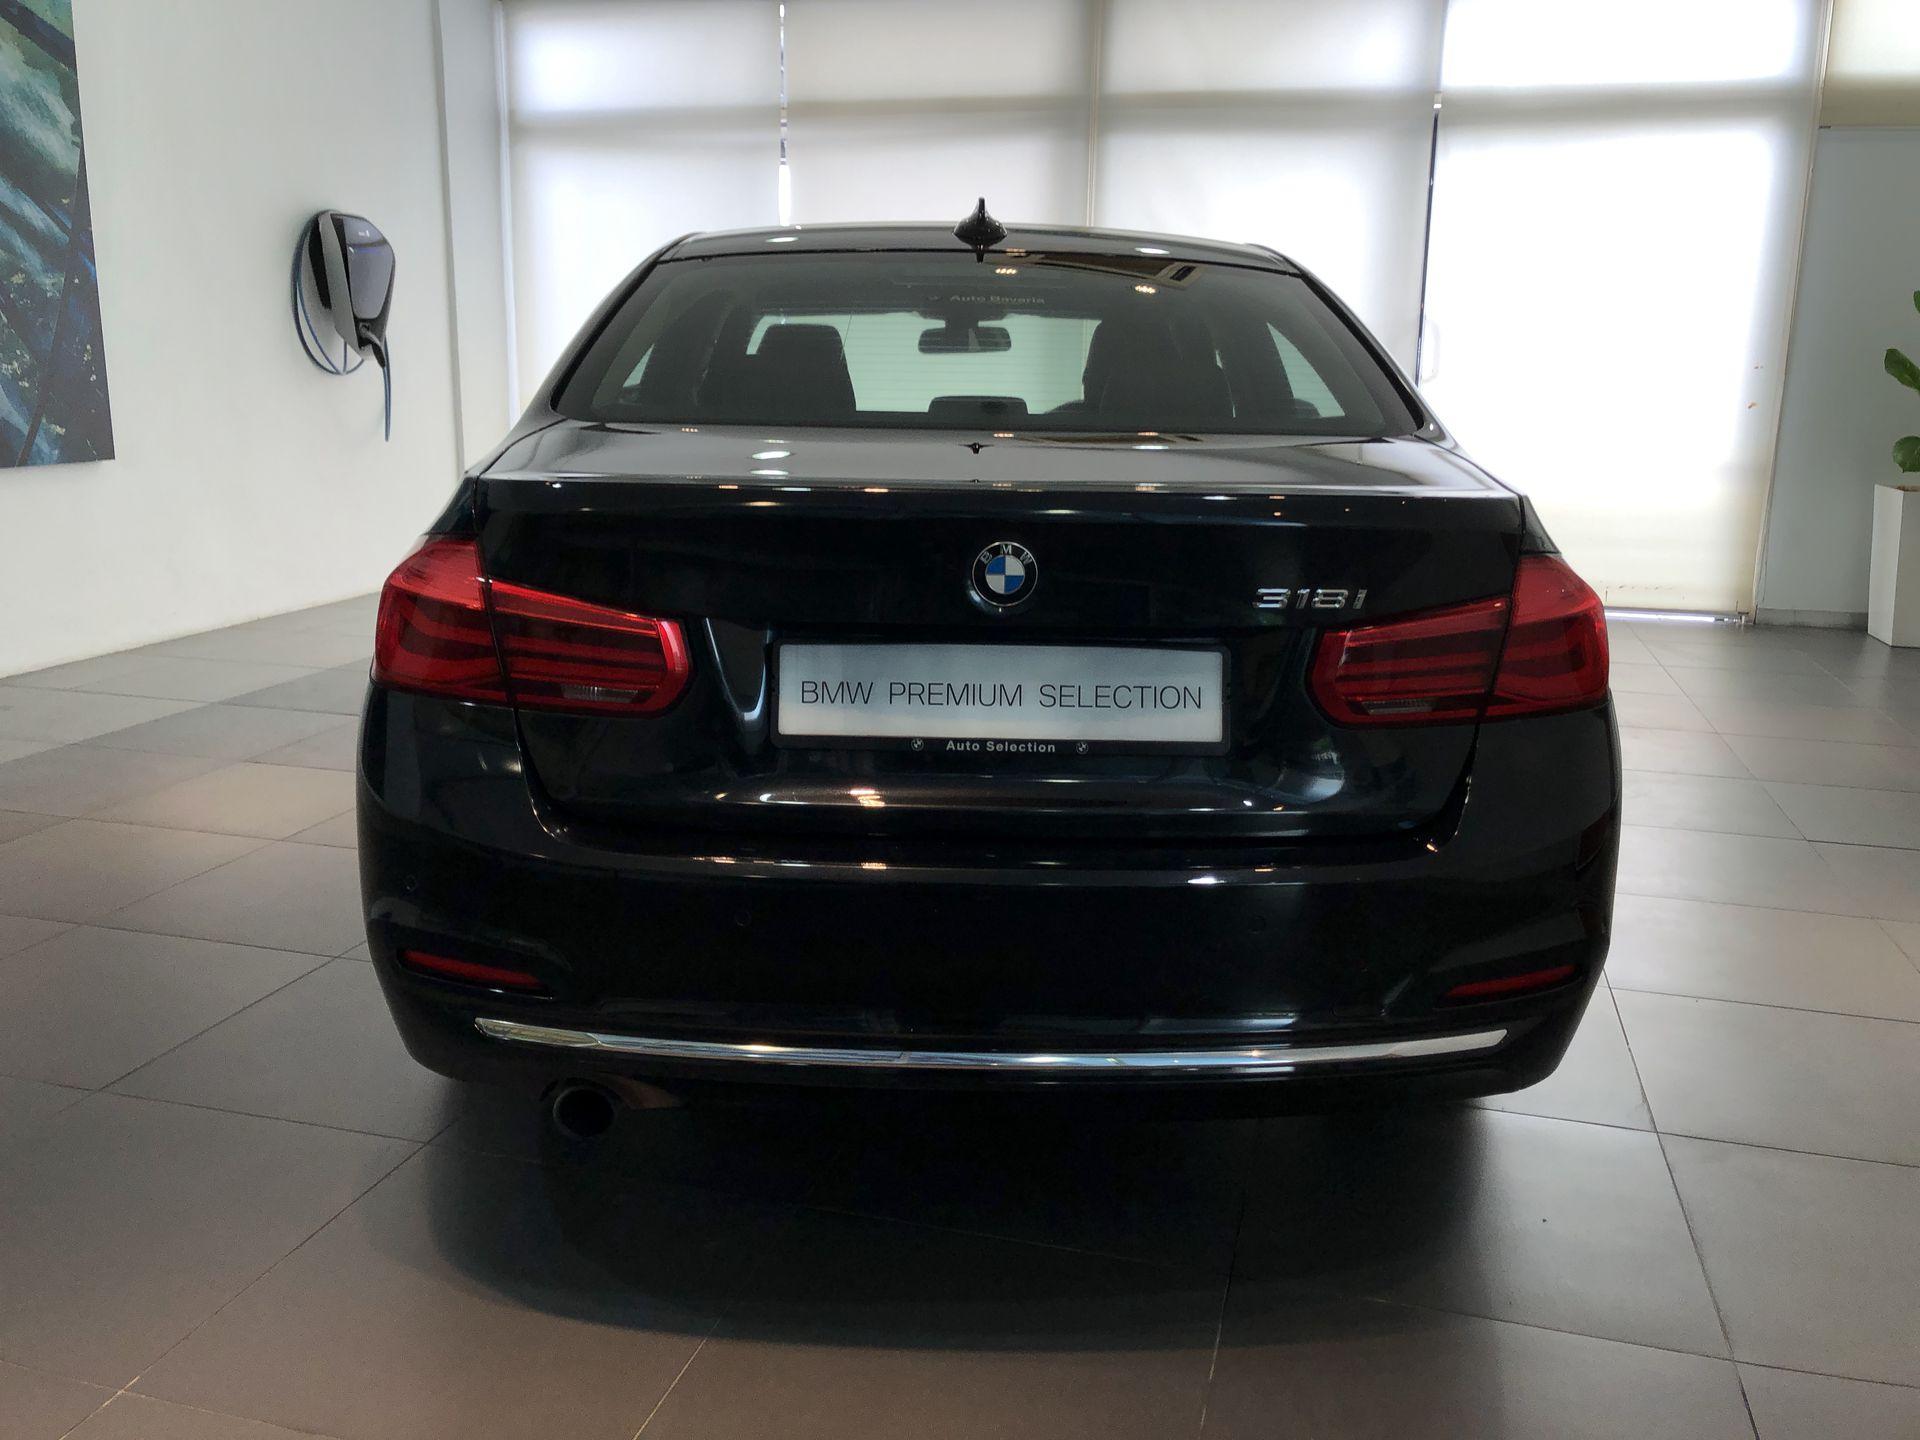 2018 BMW 318i Luxury F30 LCI - CKD